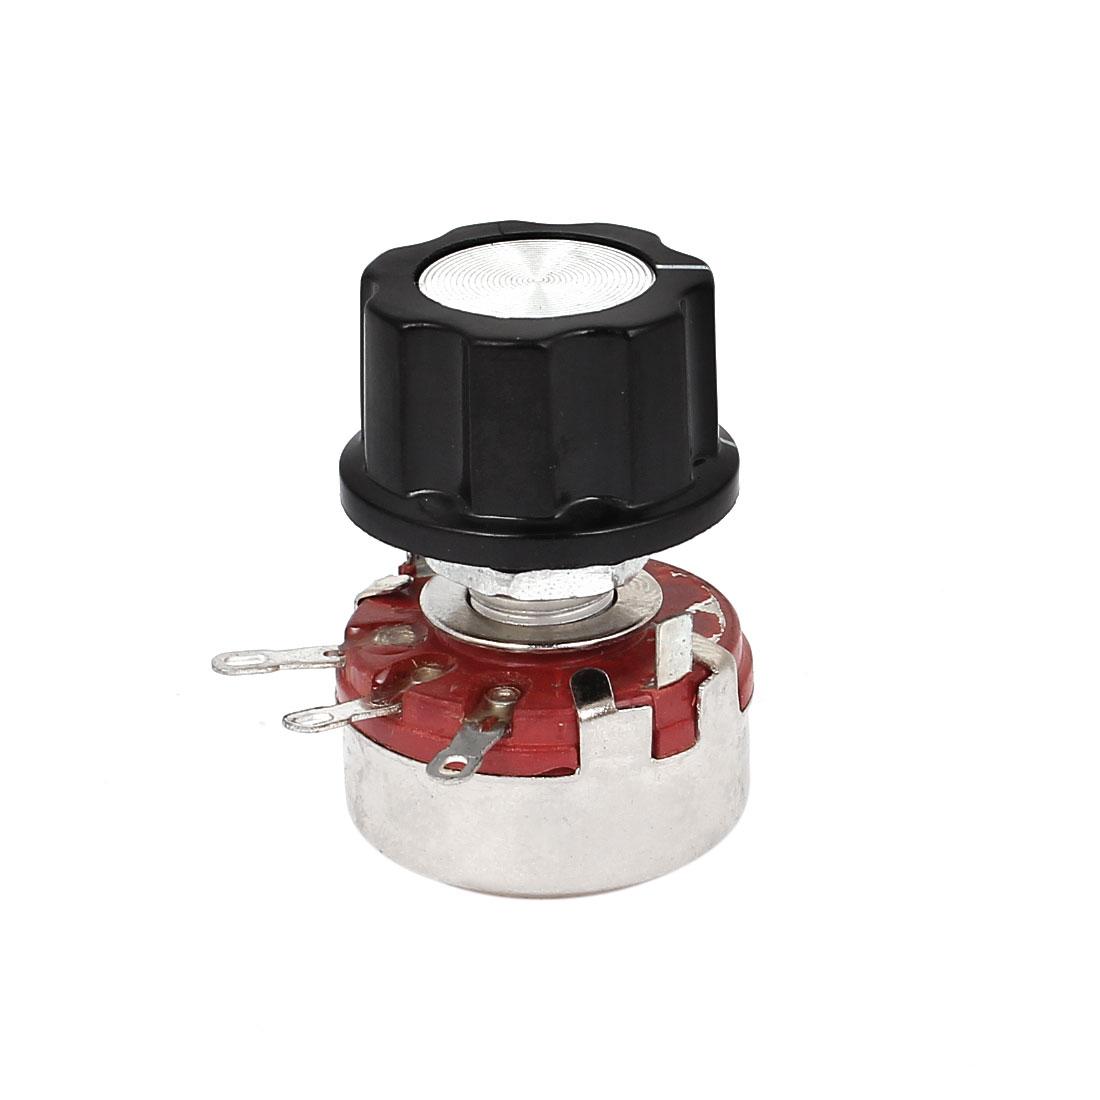 WTH118-1A 2W 10K Ohm Rotary Taper Carbon Film Potentiometer Pots w Control Knob